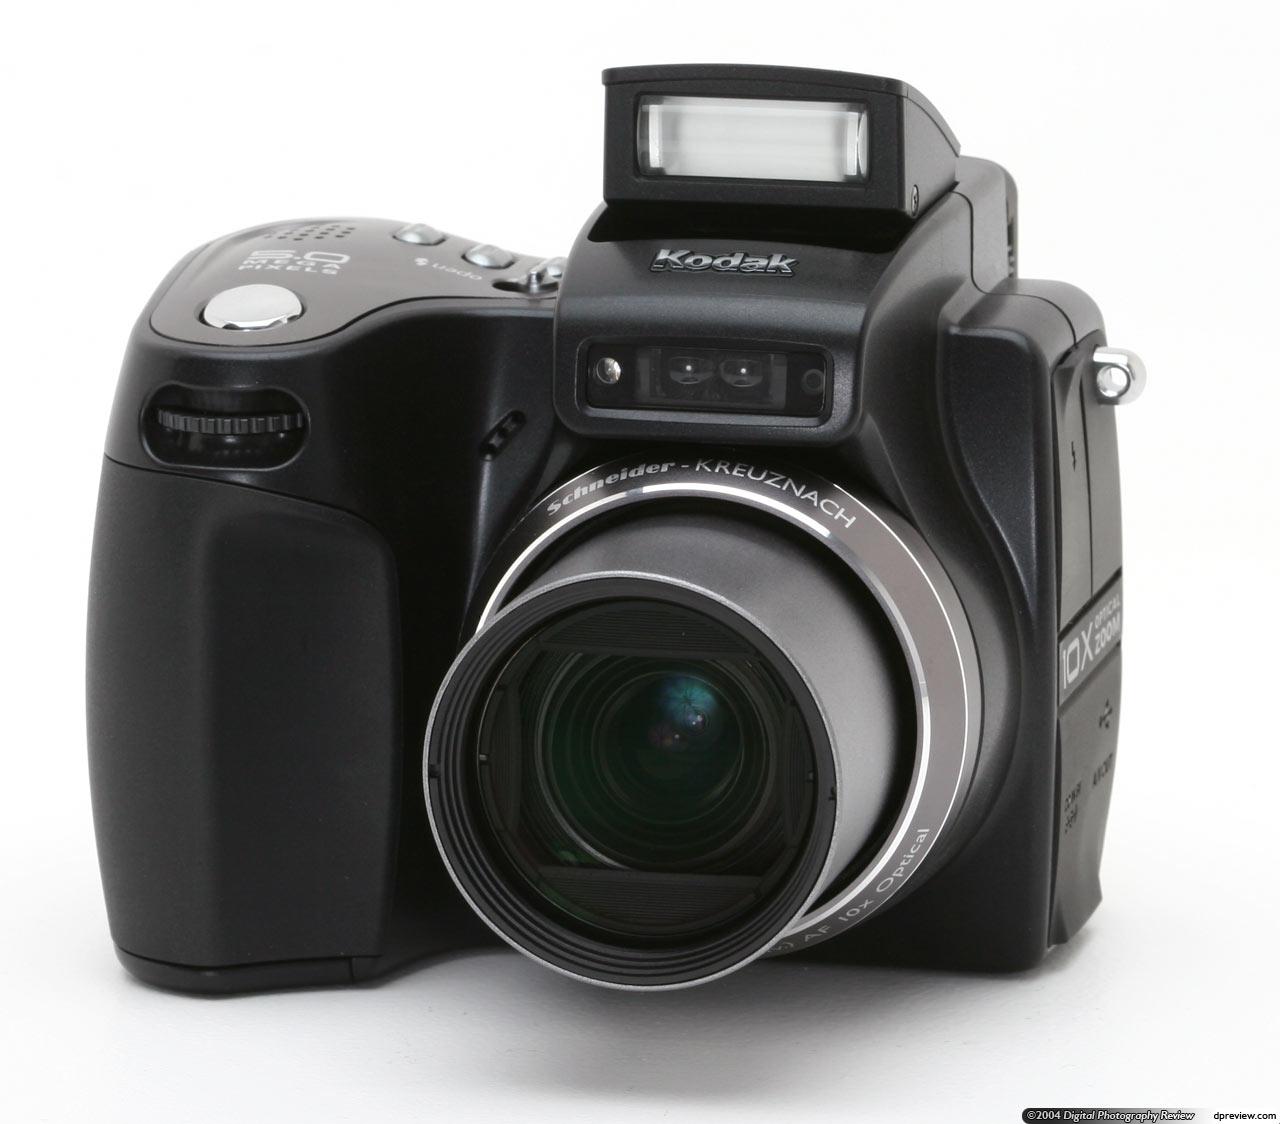 Kodak DX7590 Review: Digital Photography Review